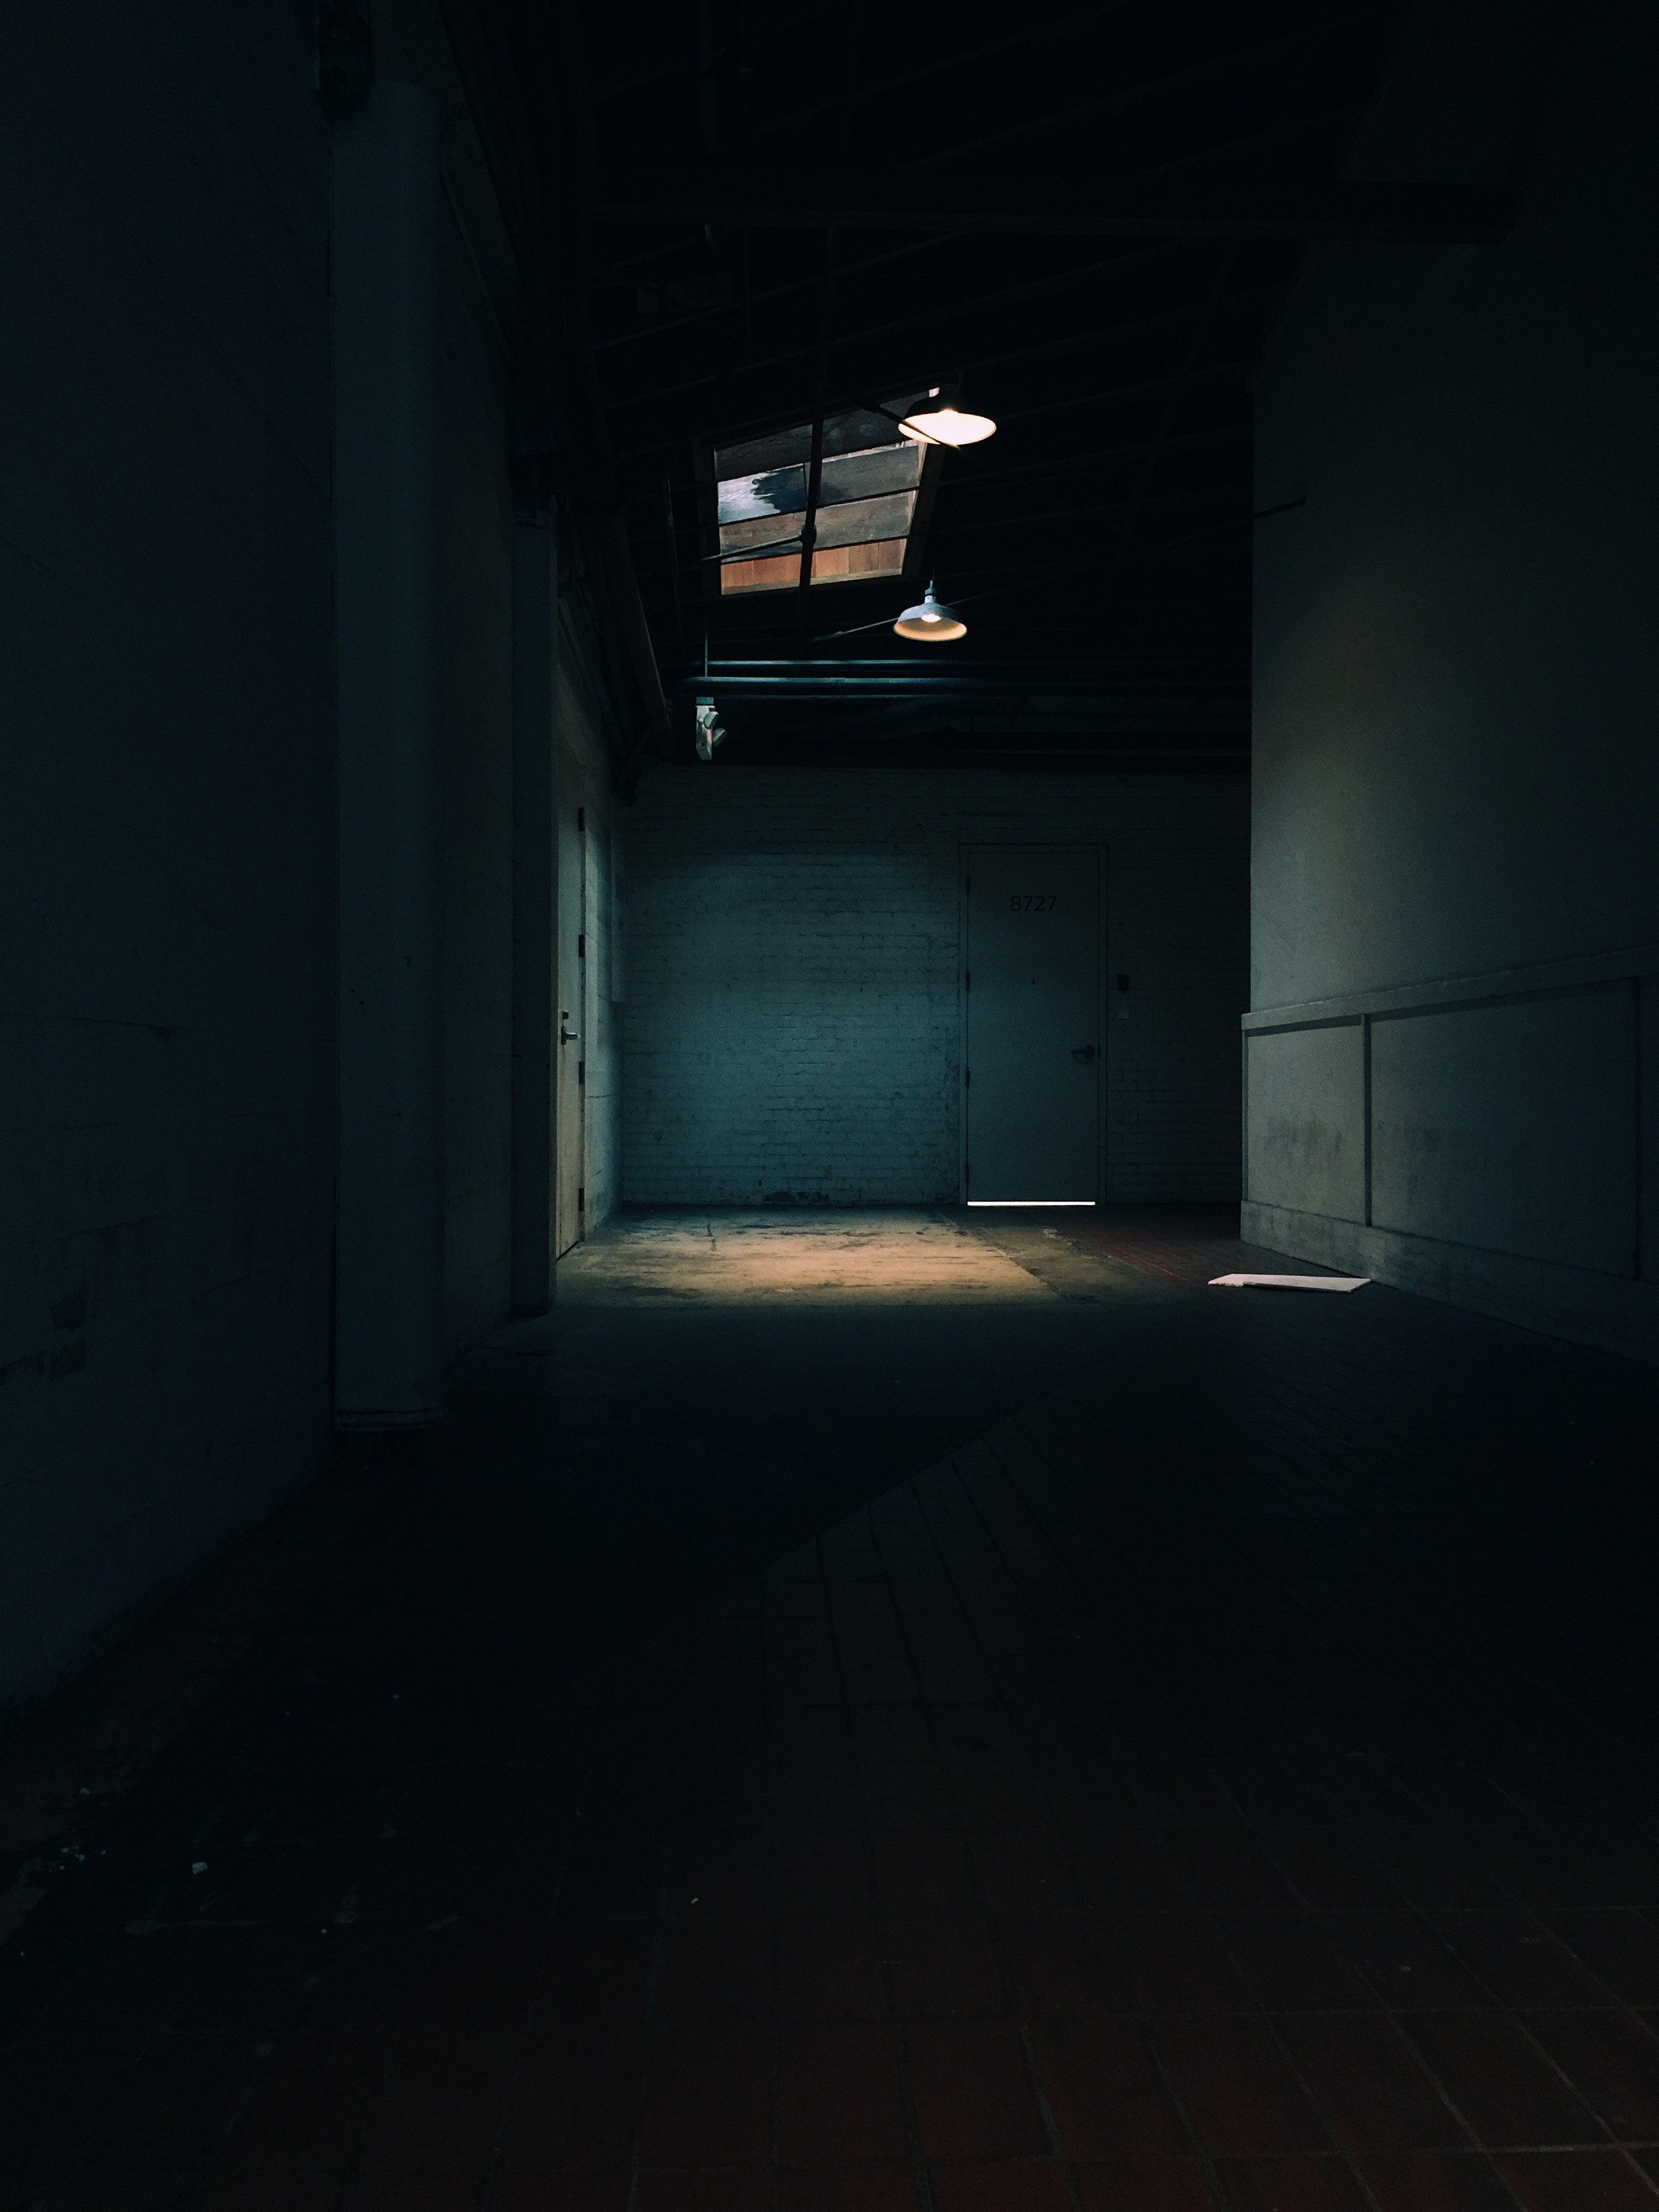 Still love the hallway walking back to this hidden studio.